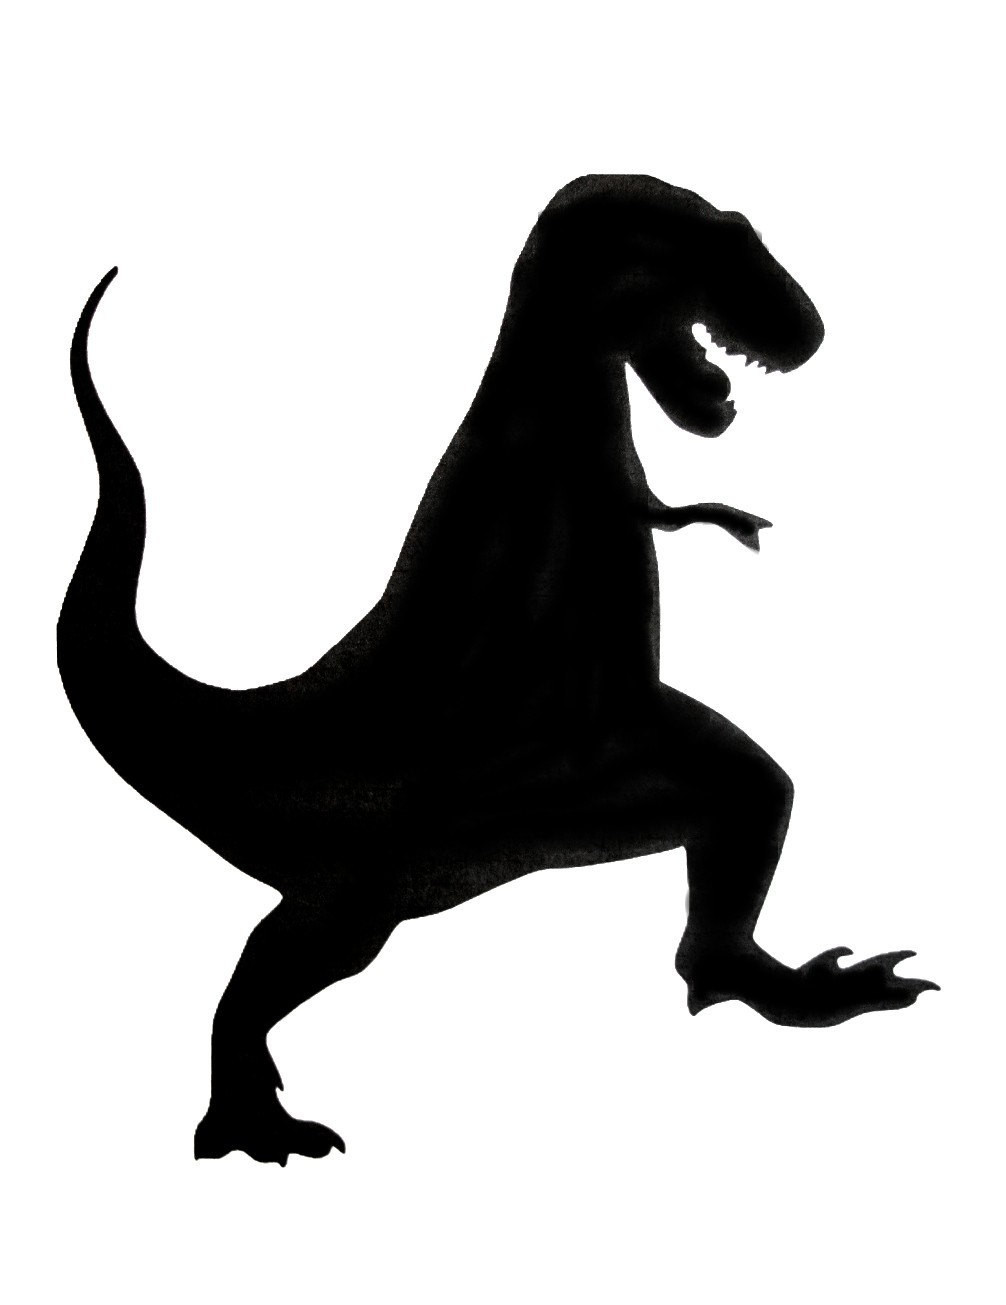 1006x1305 T Rex Dinosaur Silhouette Clipart Magnificent Simple Cool